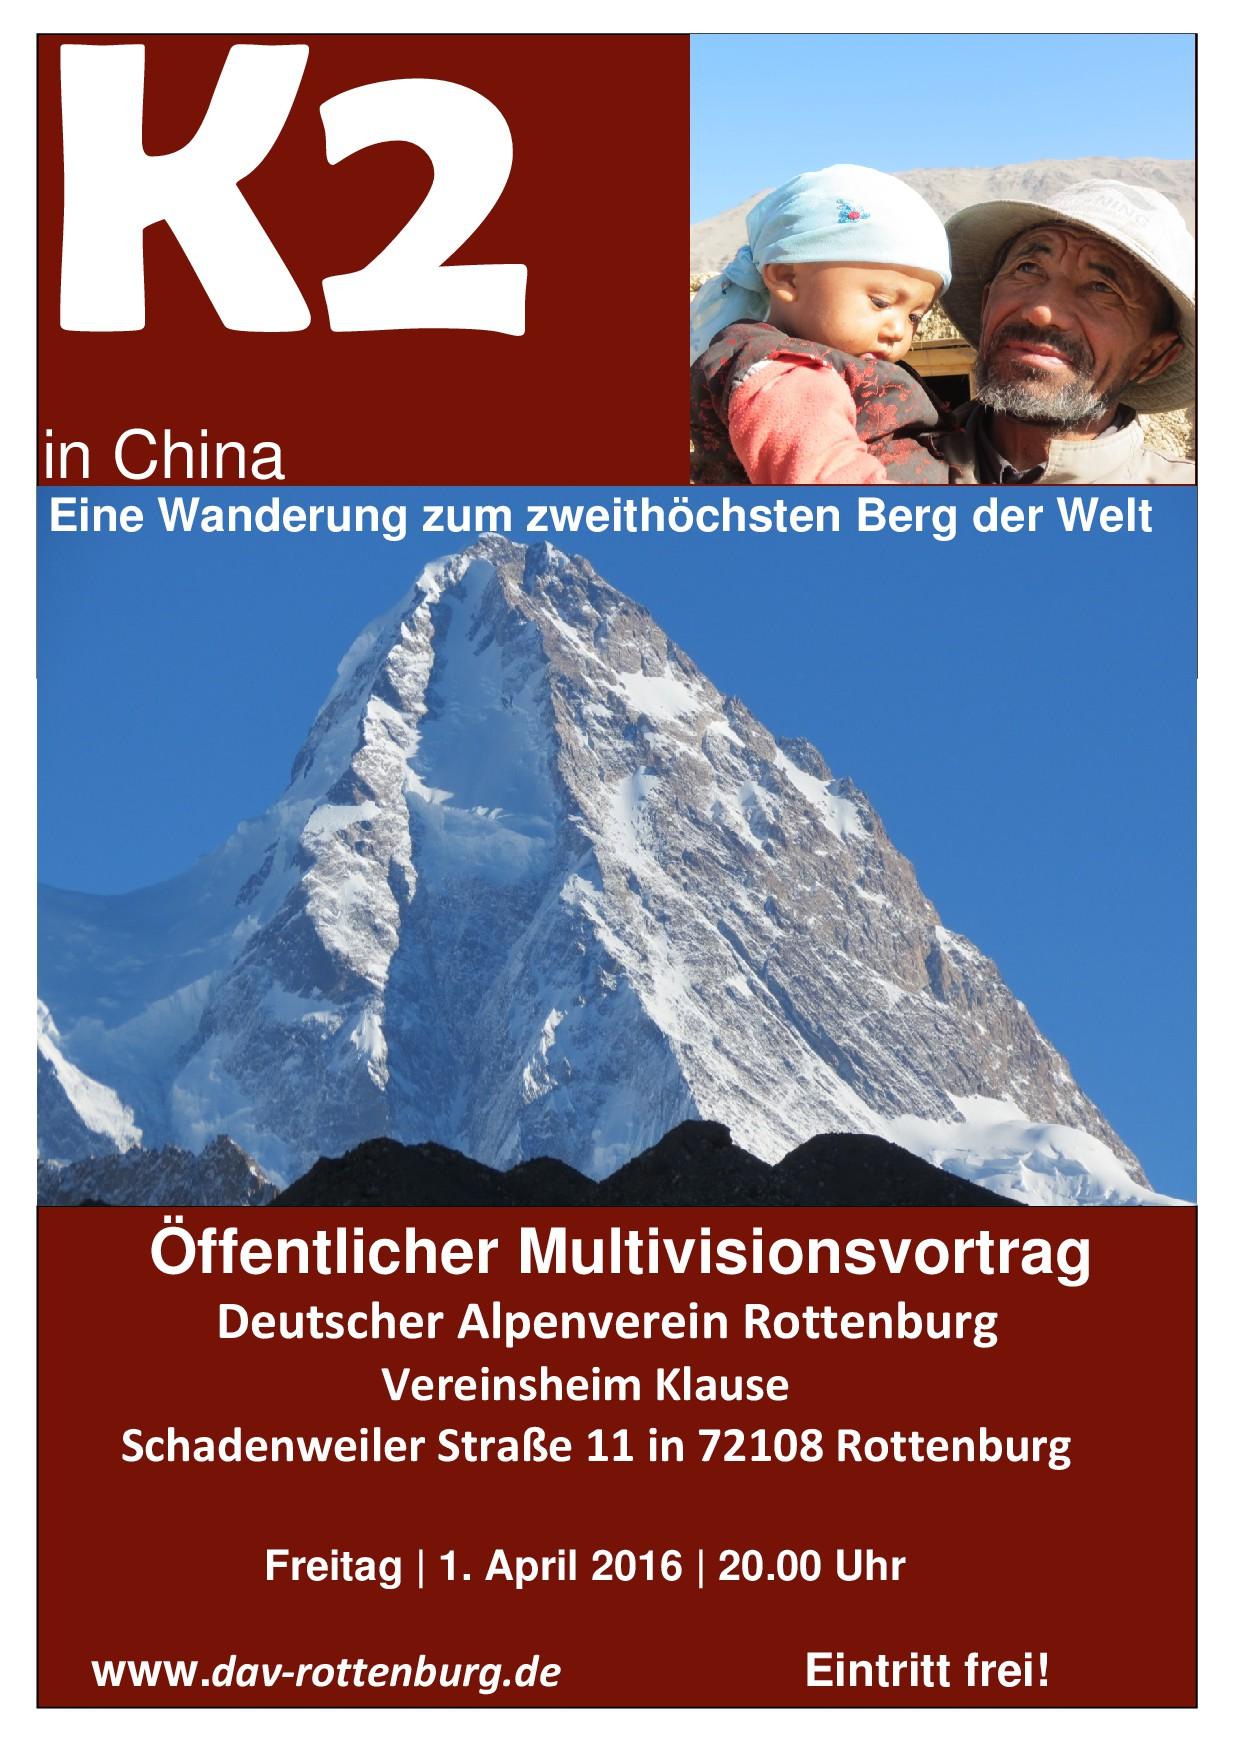 Einladungsplakat K2 China DAV Rottenburg-001